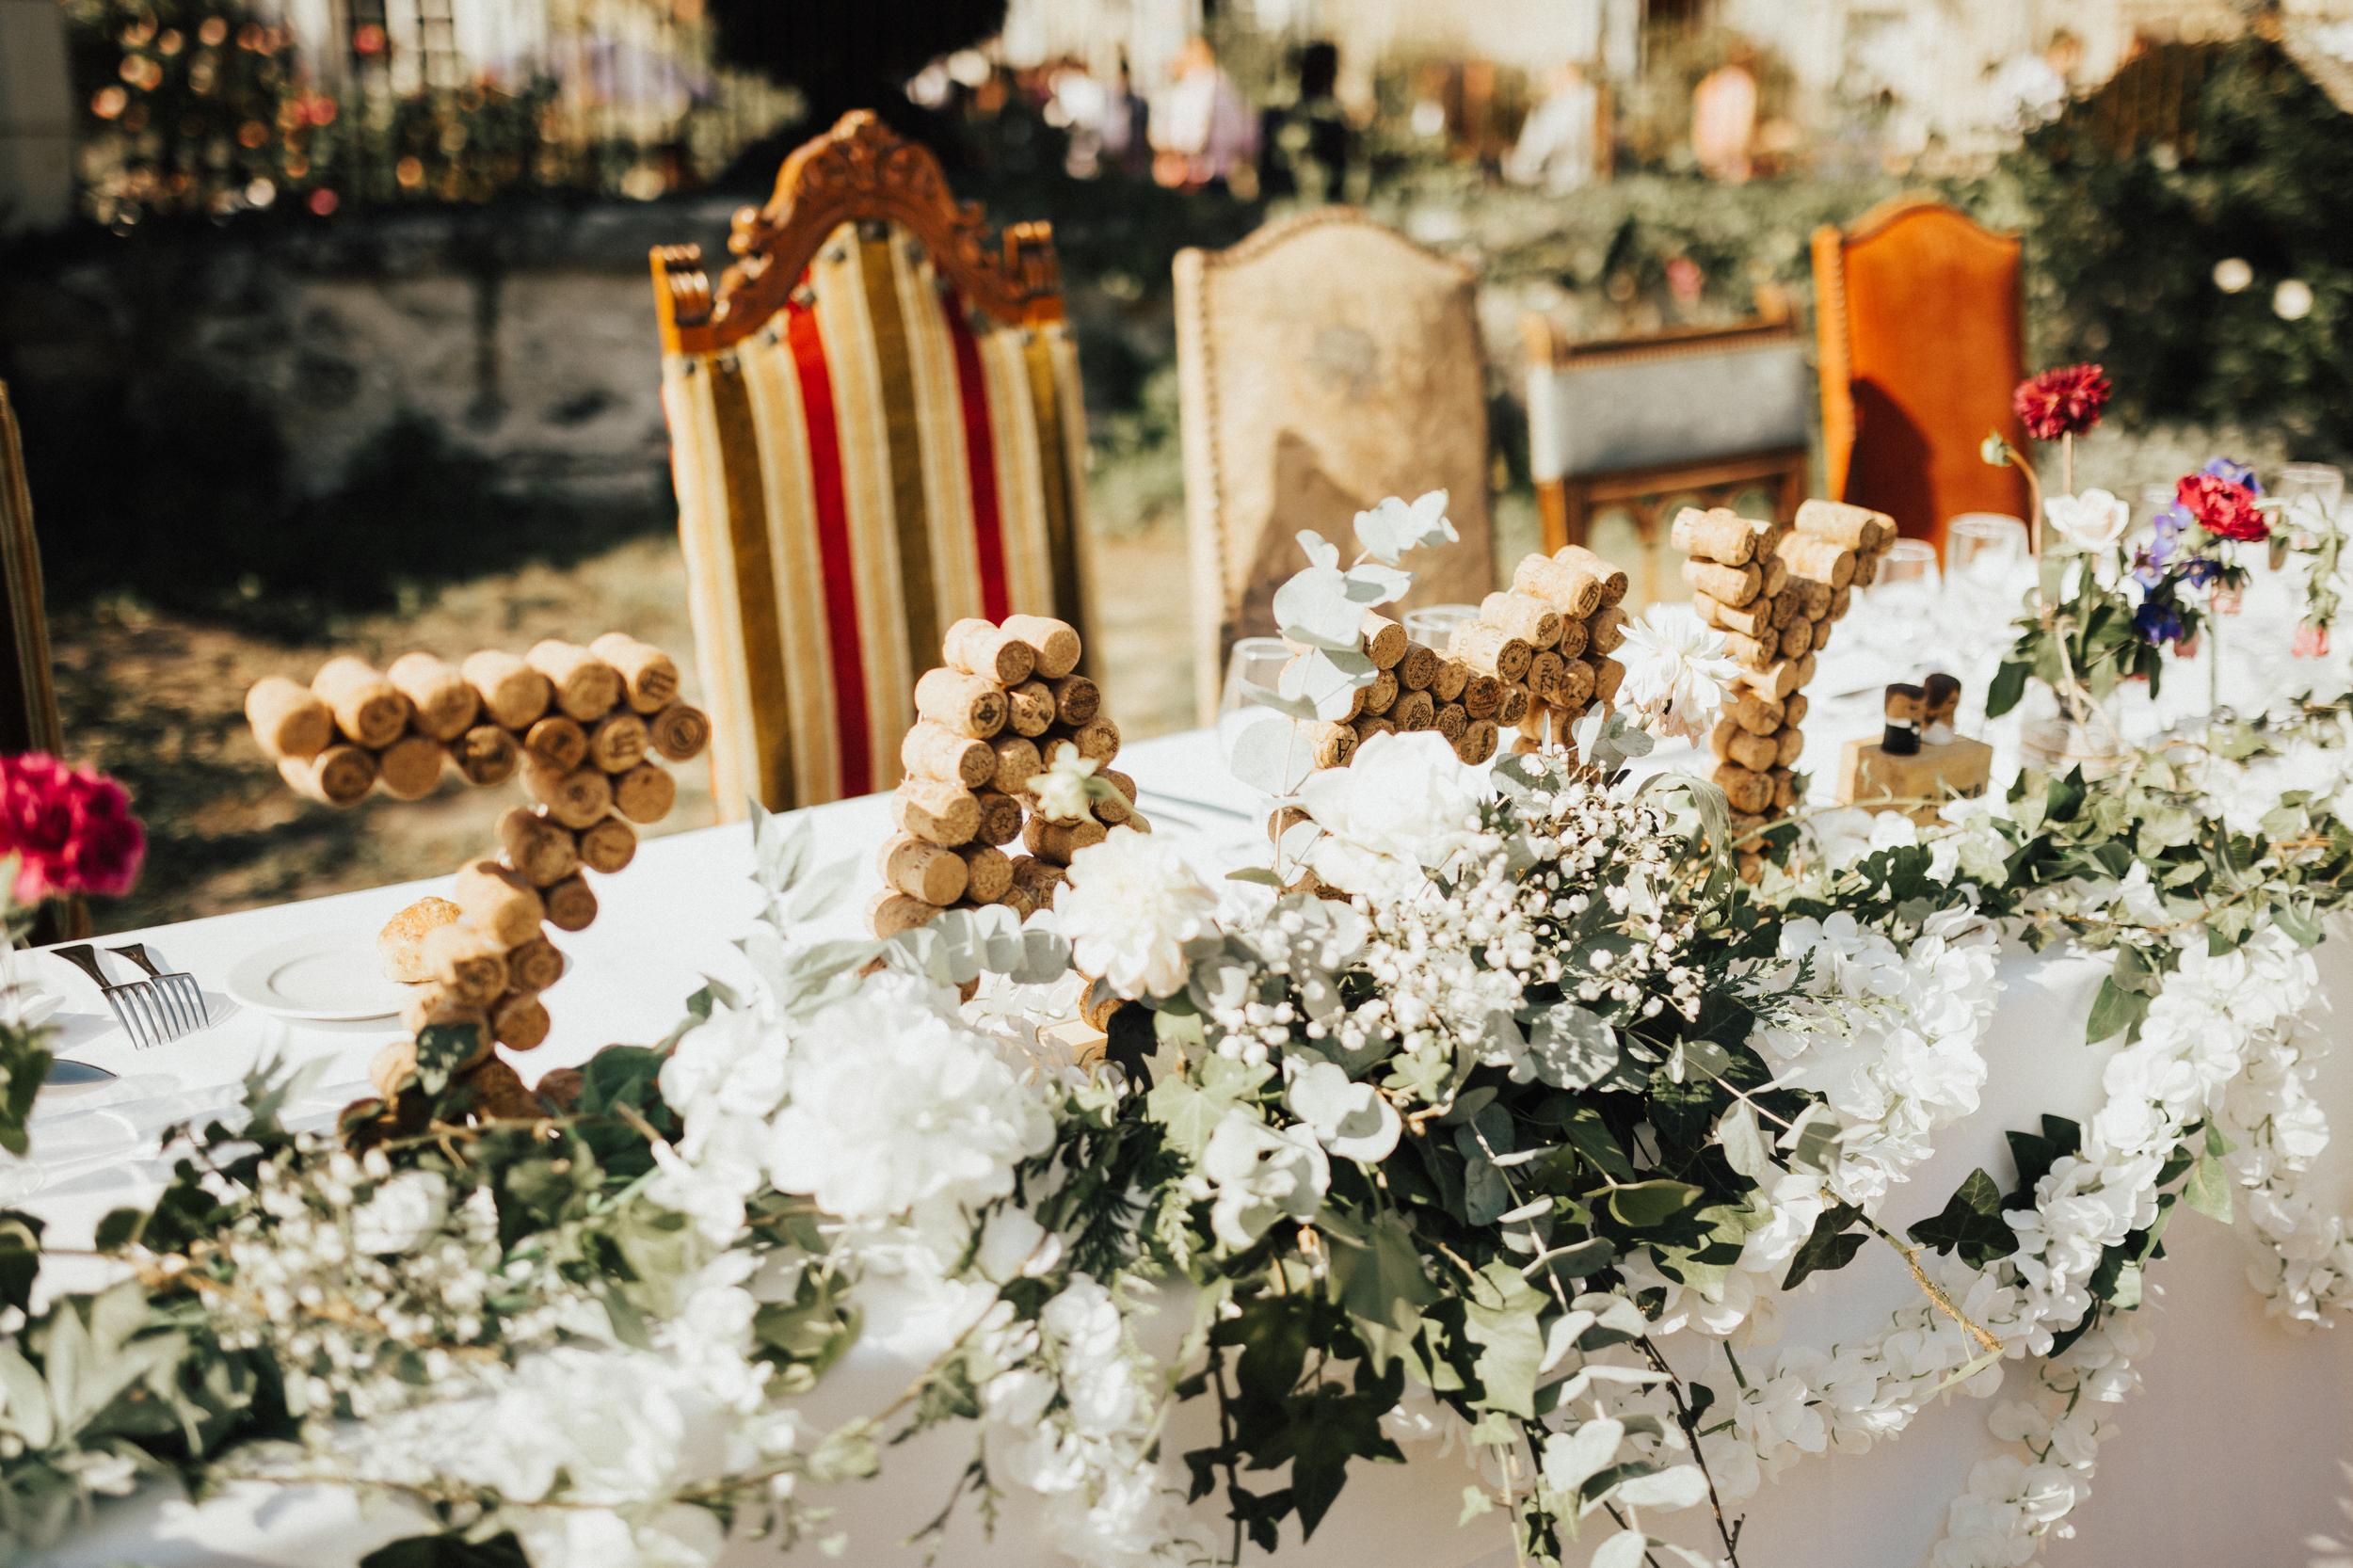 Amy-Zac-Destination-Wedding-France-Manoir-Foulquetiere-Darina-Stoda-Photography-59.jpg